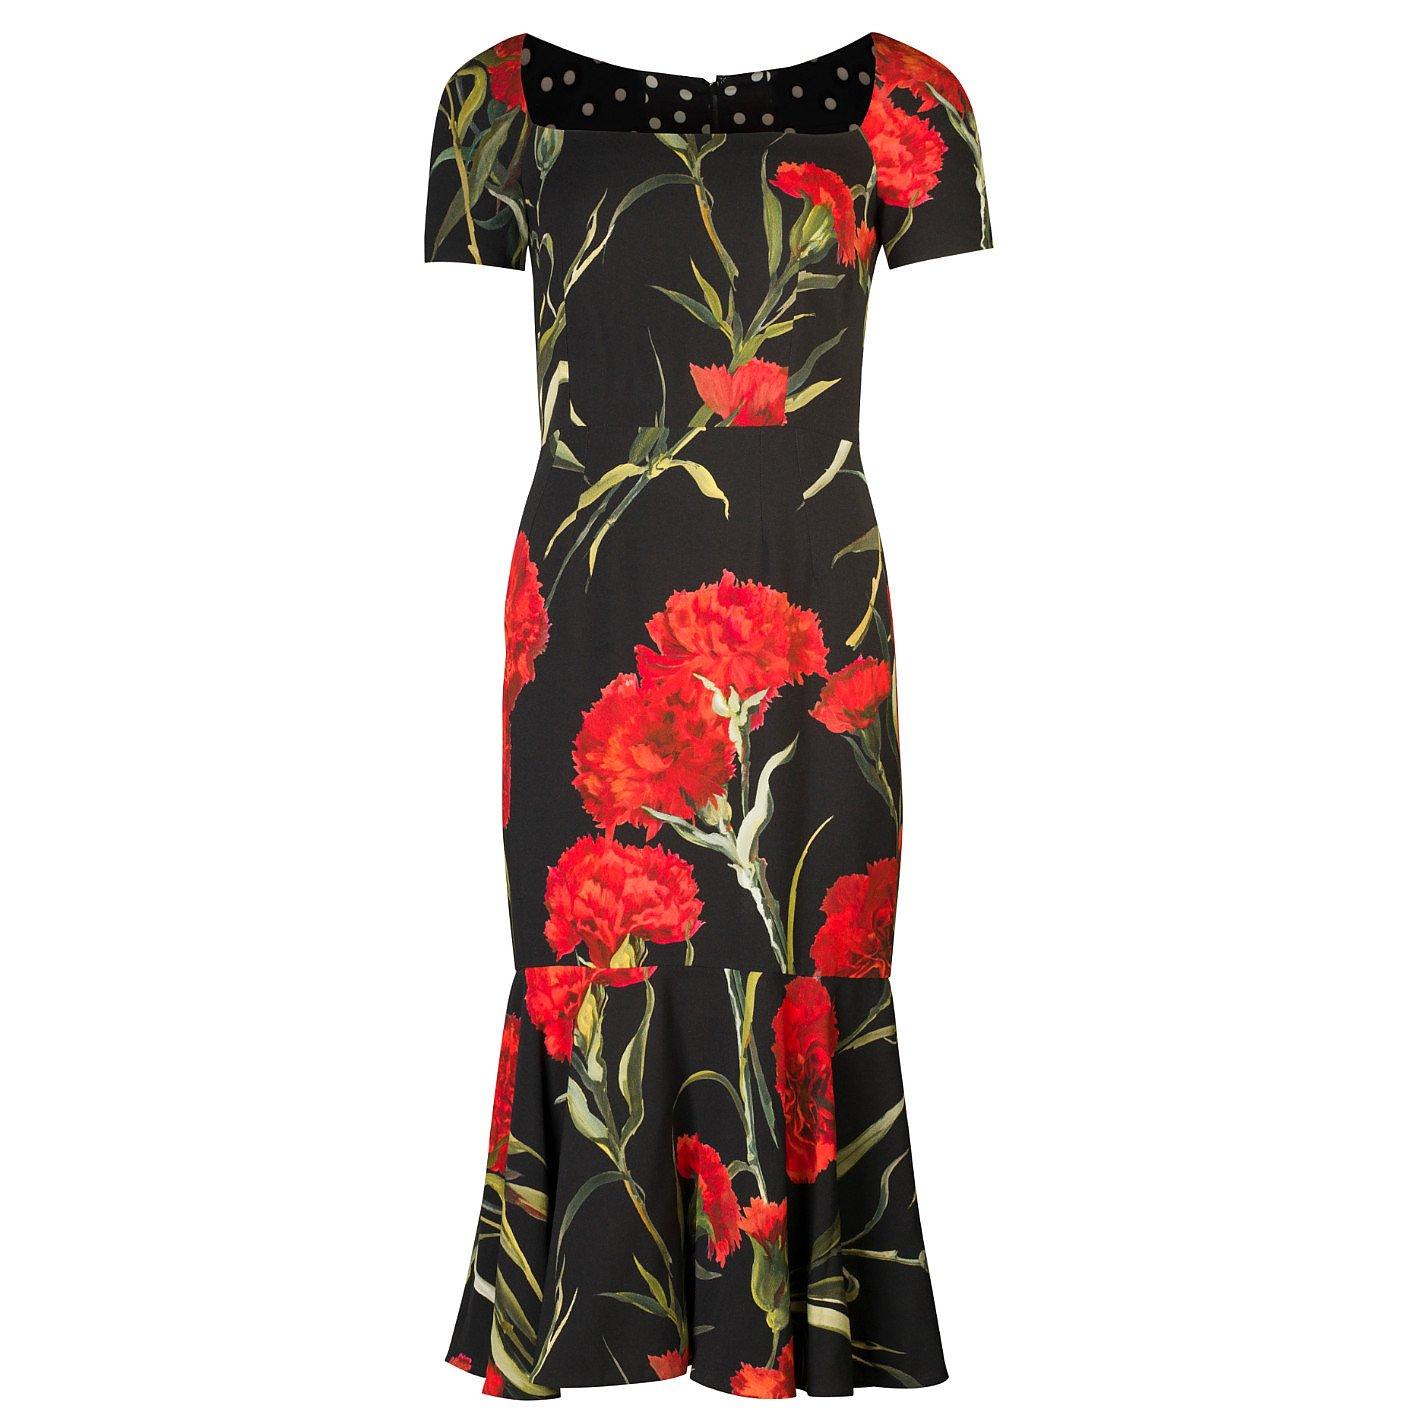 DOLCE & GABBANA Carnation-Print Midi Dress